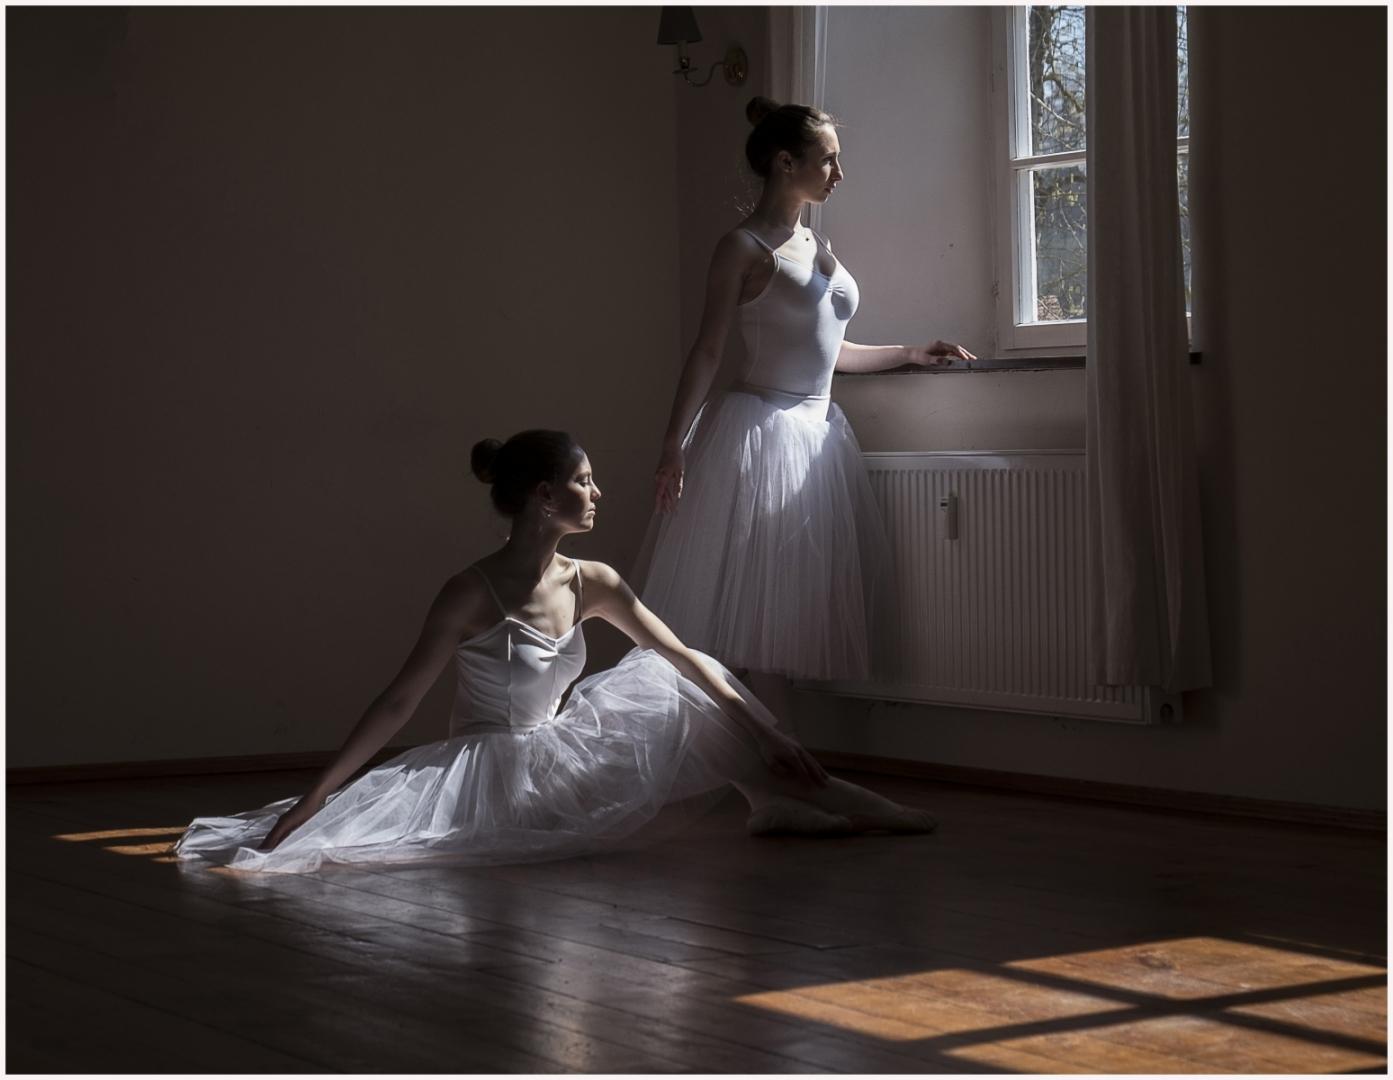 015-Ballett-250317